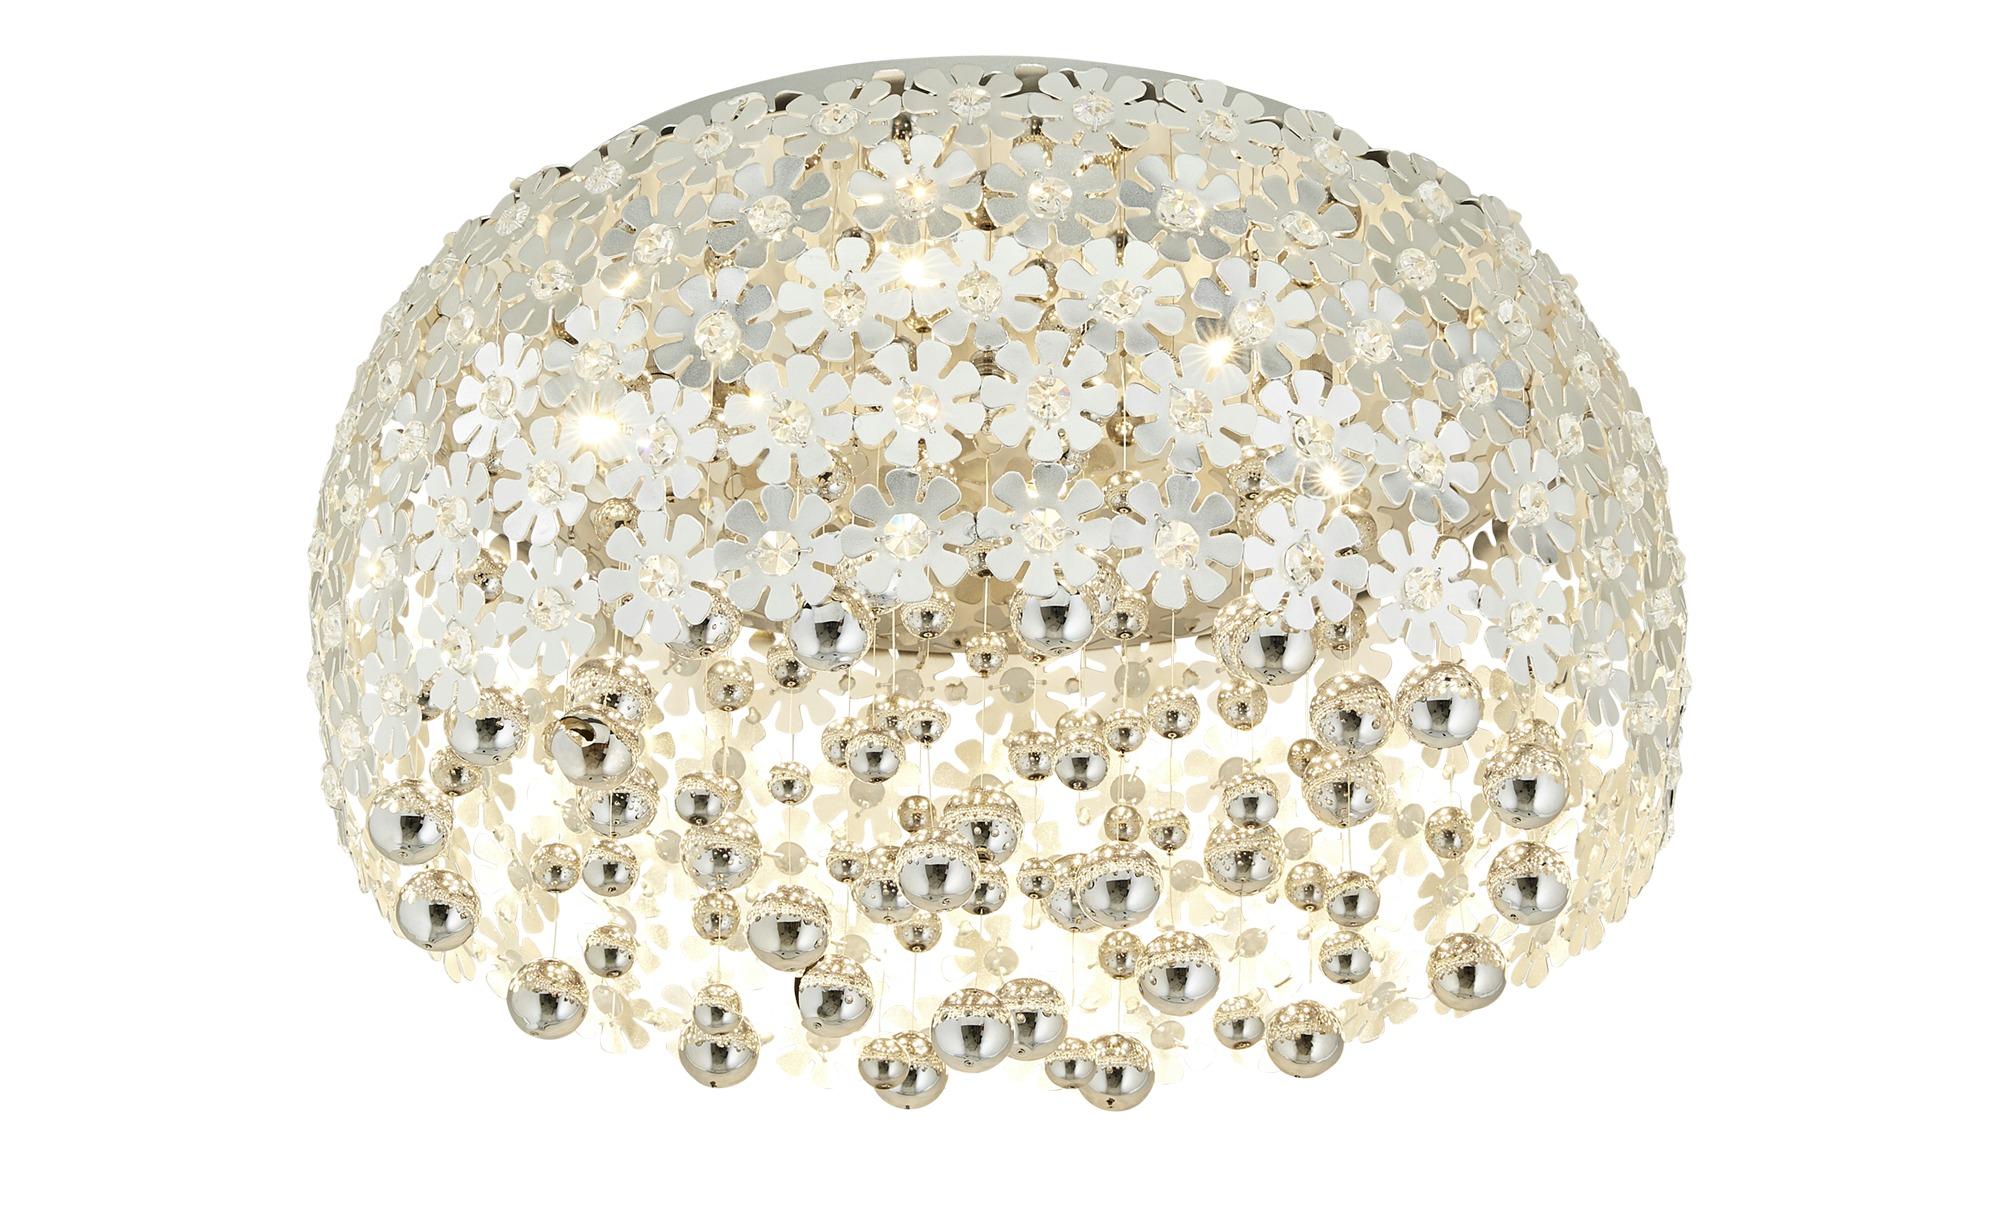 KHG LED-Deckenleuchte mit Behang ¦ silber ¦ Maße (cm): H: 32 Ø: [50.0] Lampen & Leuchten > Innenleuchten > Deckenleuchten - Höffner